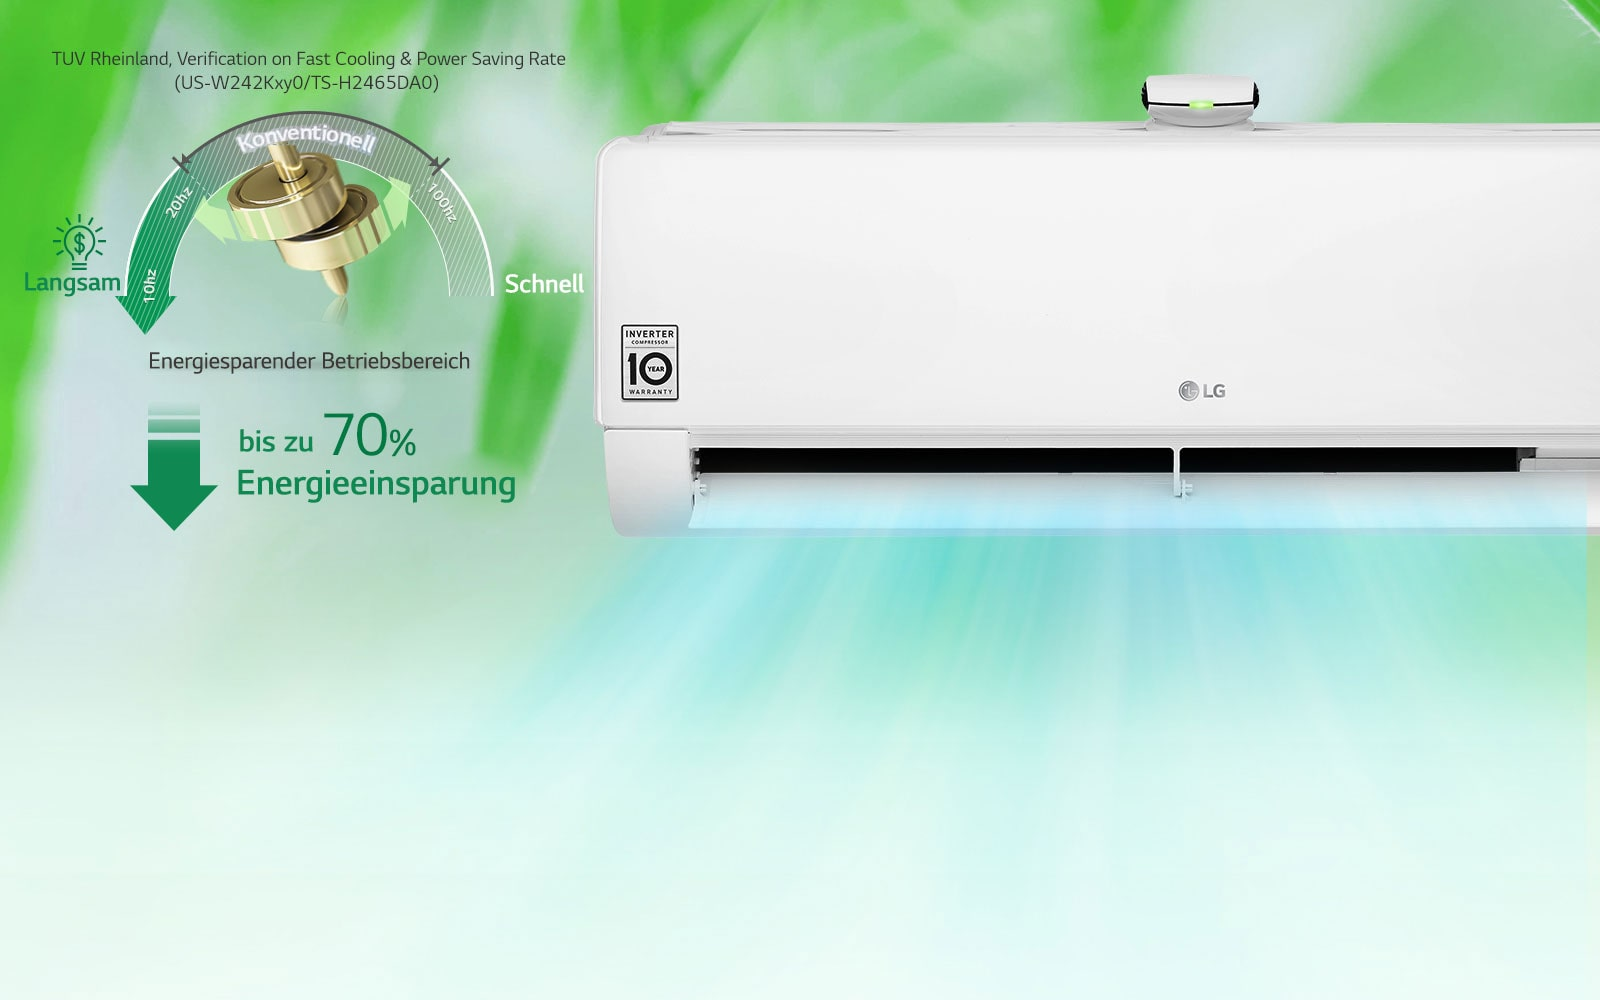 Energieeinsparung1